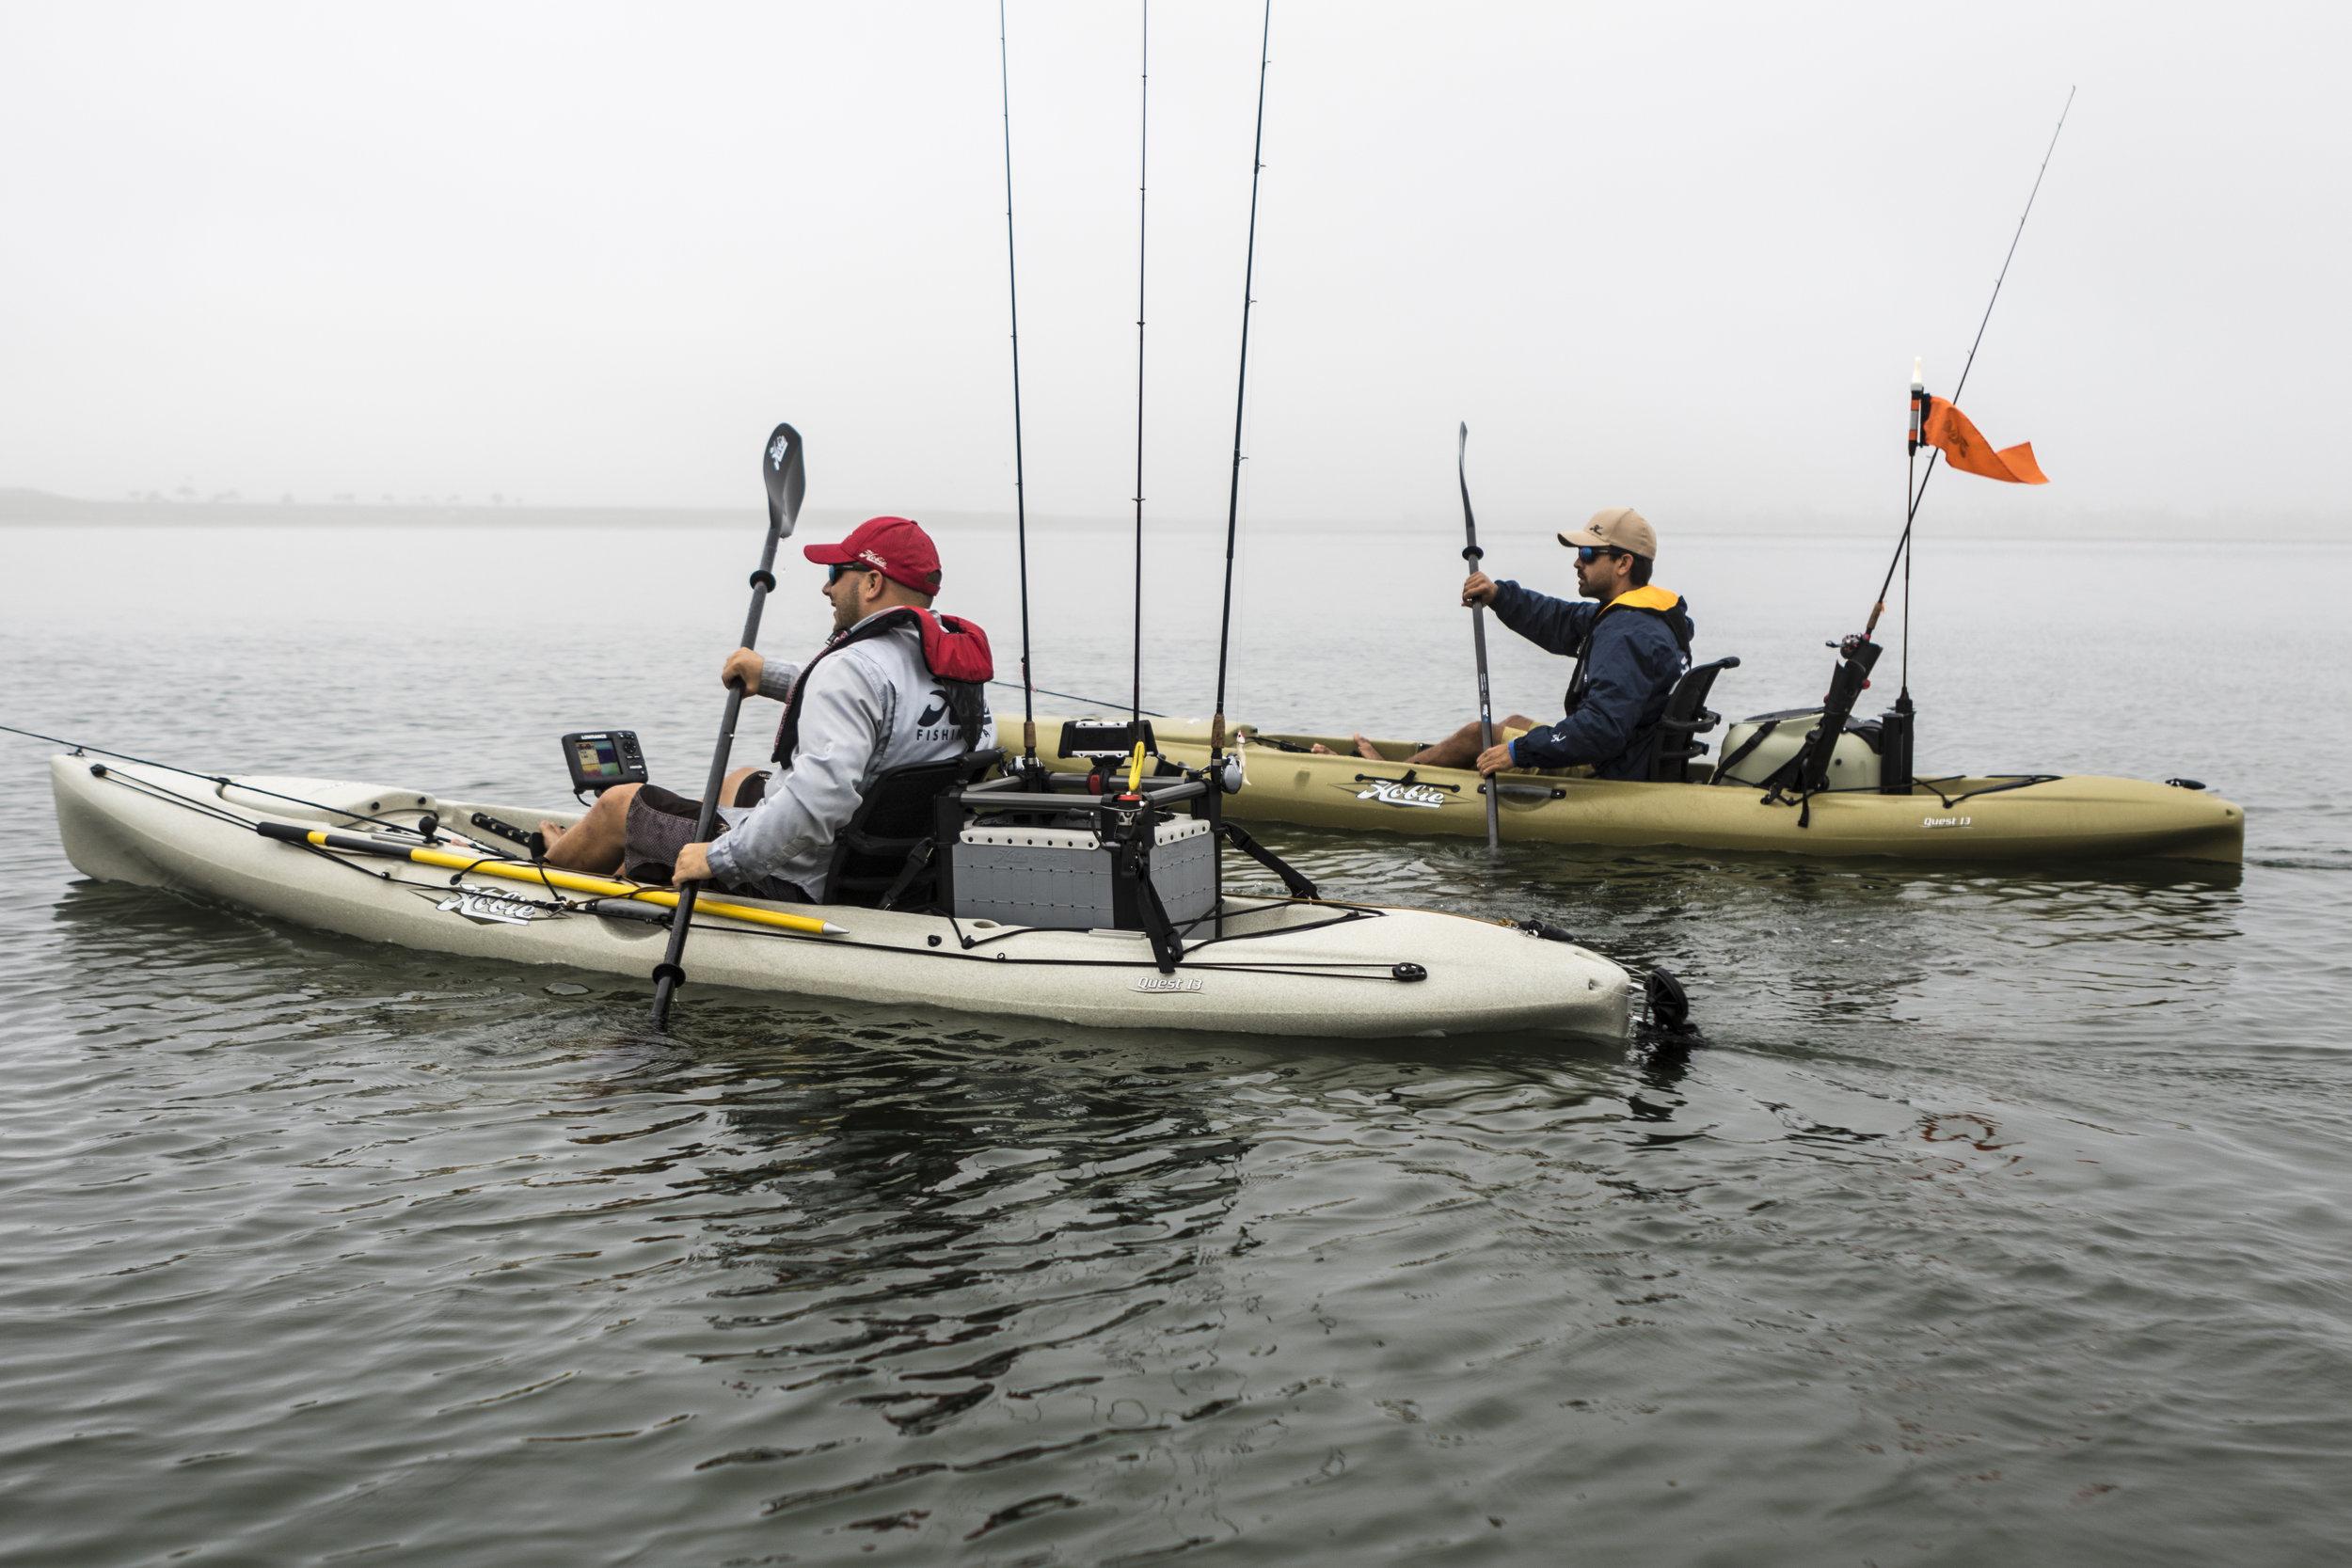 Quest13_fishing_foggy_Shane_Howie_paddling_9021_full.jpg